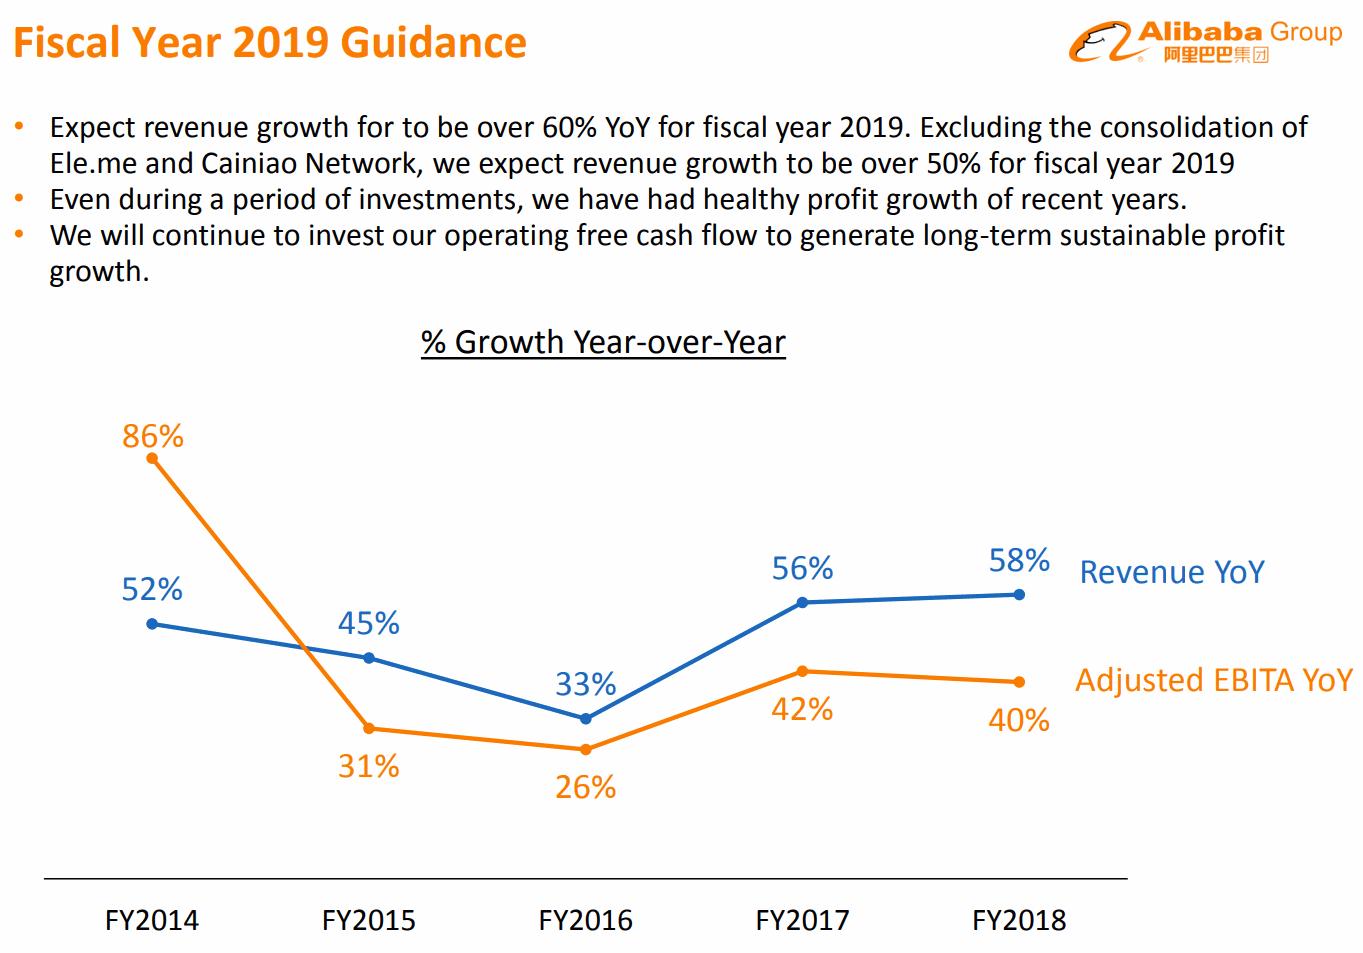 2018Q1-Fiscal-Year-2019-Guidance-Alibaba